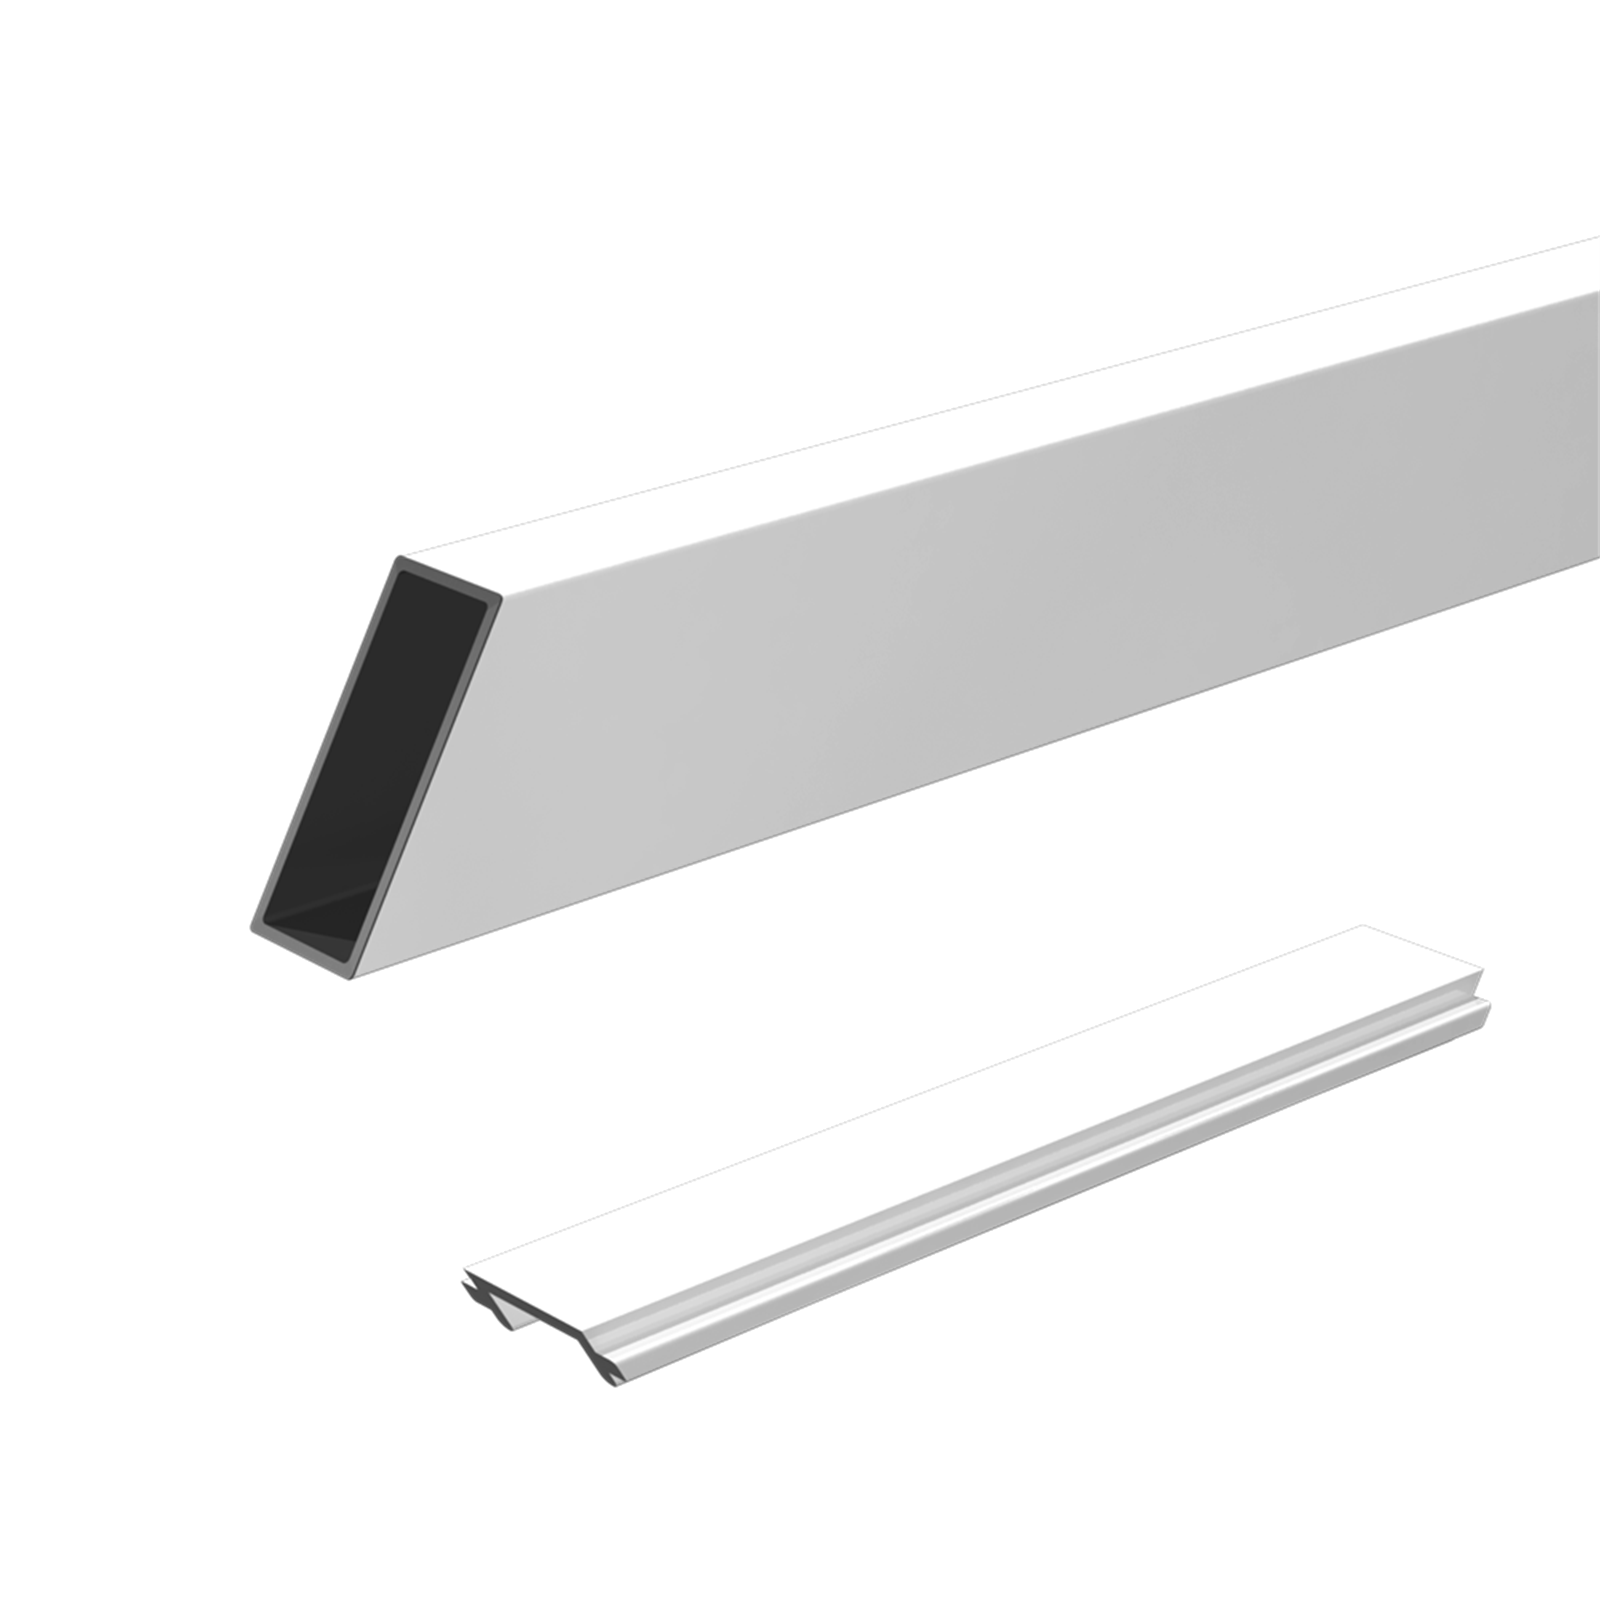 Peak 1800mm Black Aluminium Balustrade Wide Stair Balusters And Spacer Kit